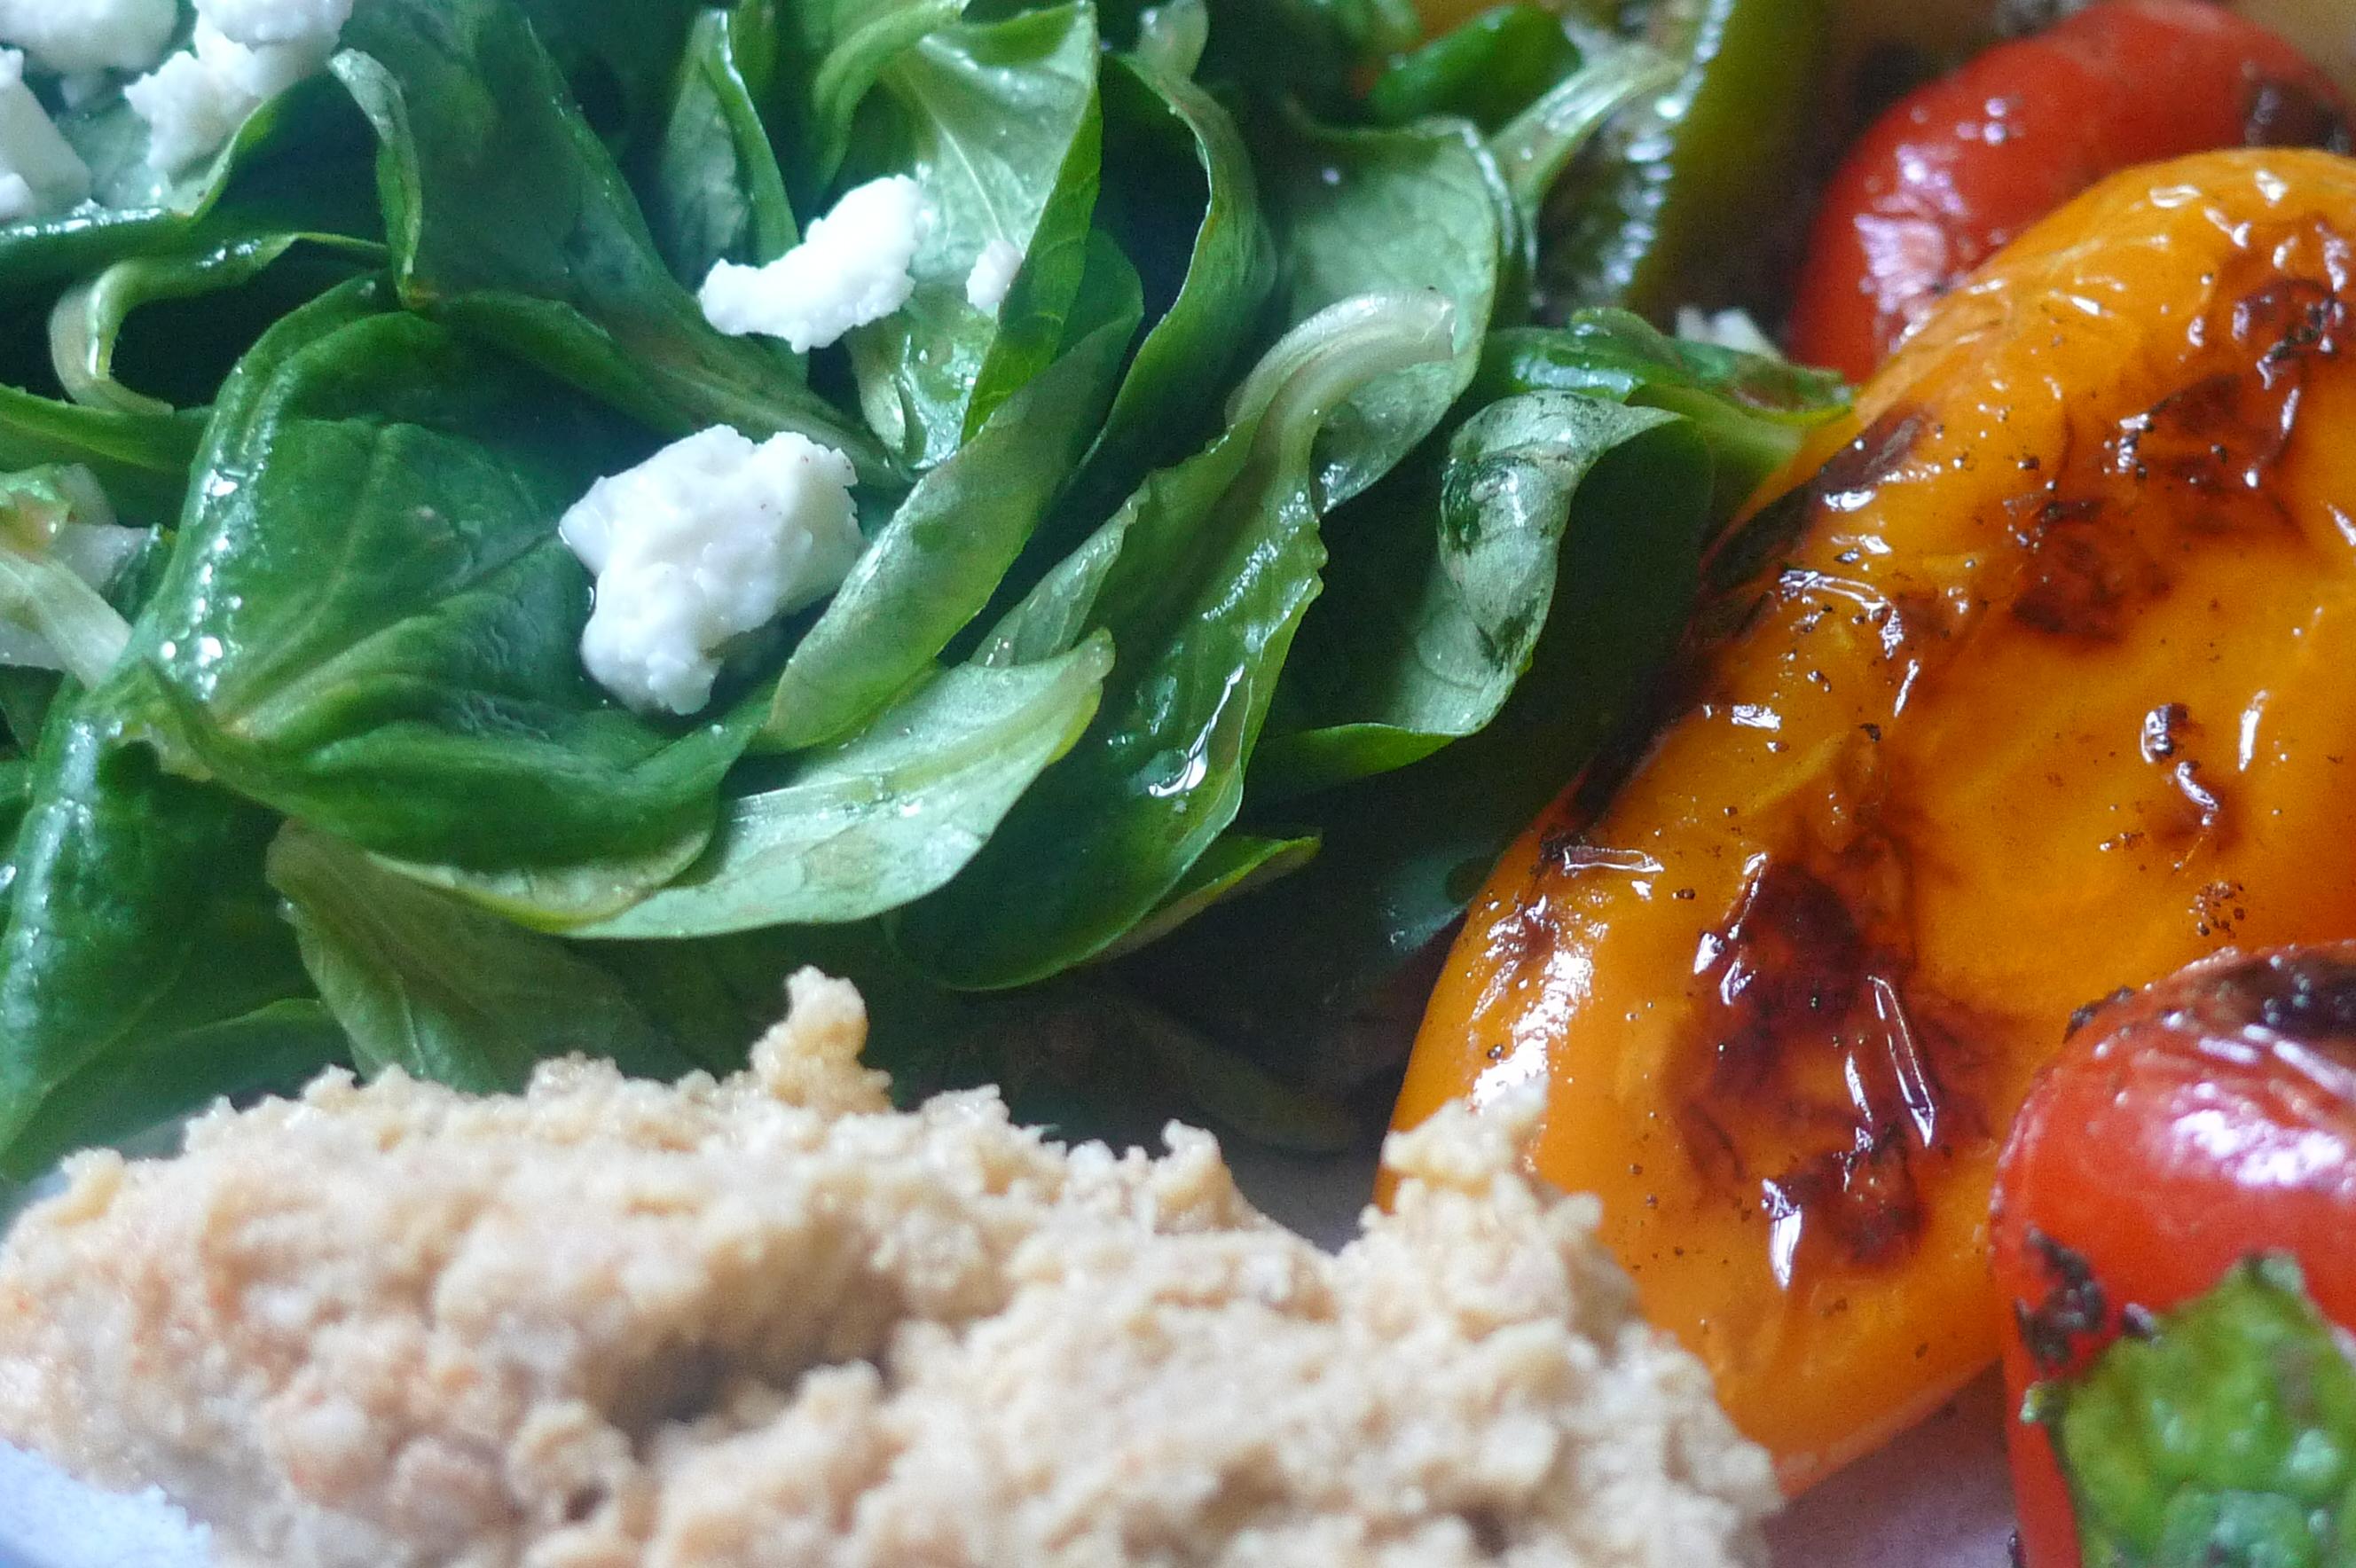 Pimentos-Paprika-Kartoffel-Salat-Buttermilch- 28.9.14   (15)